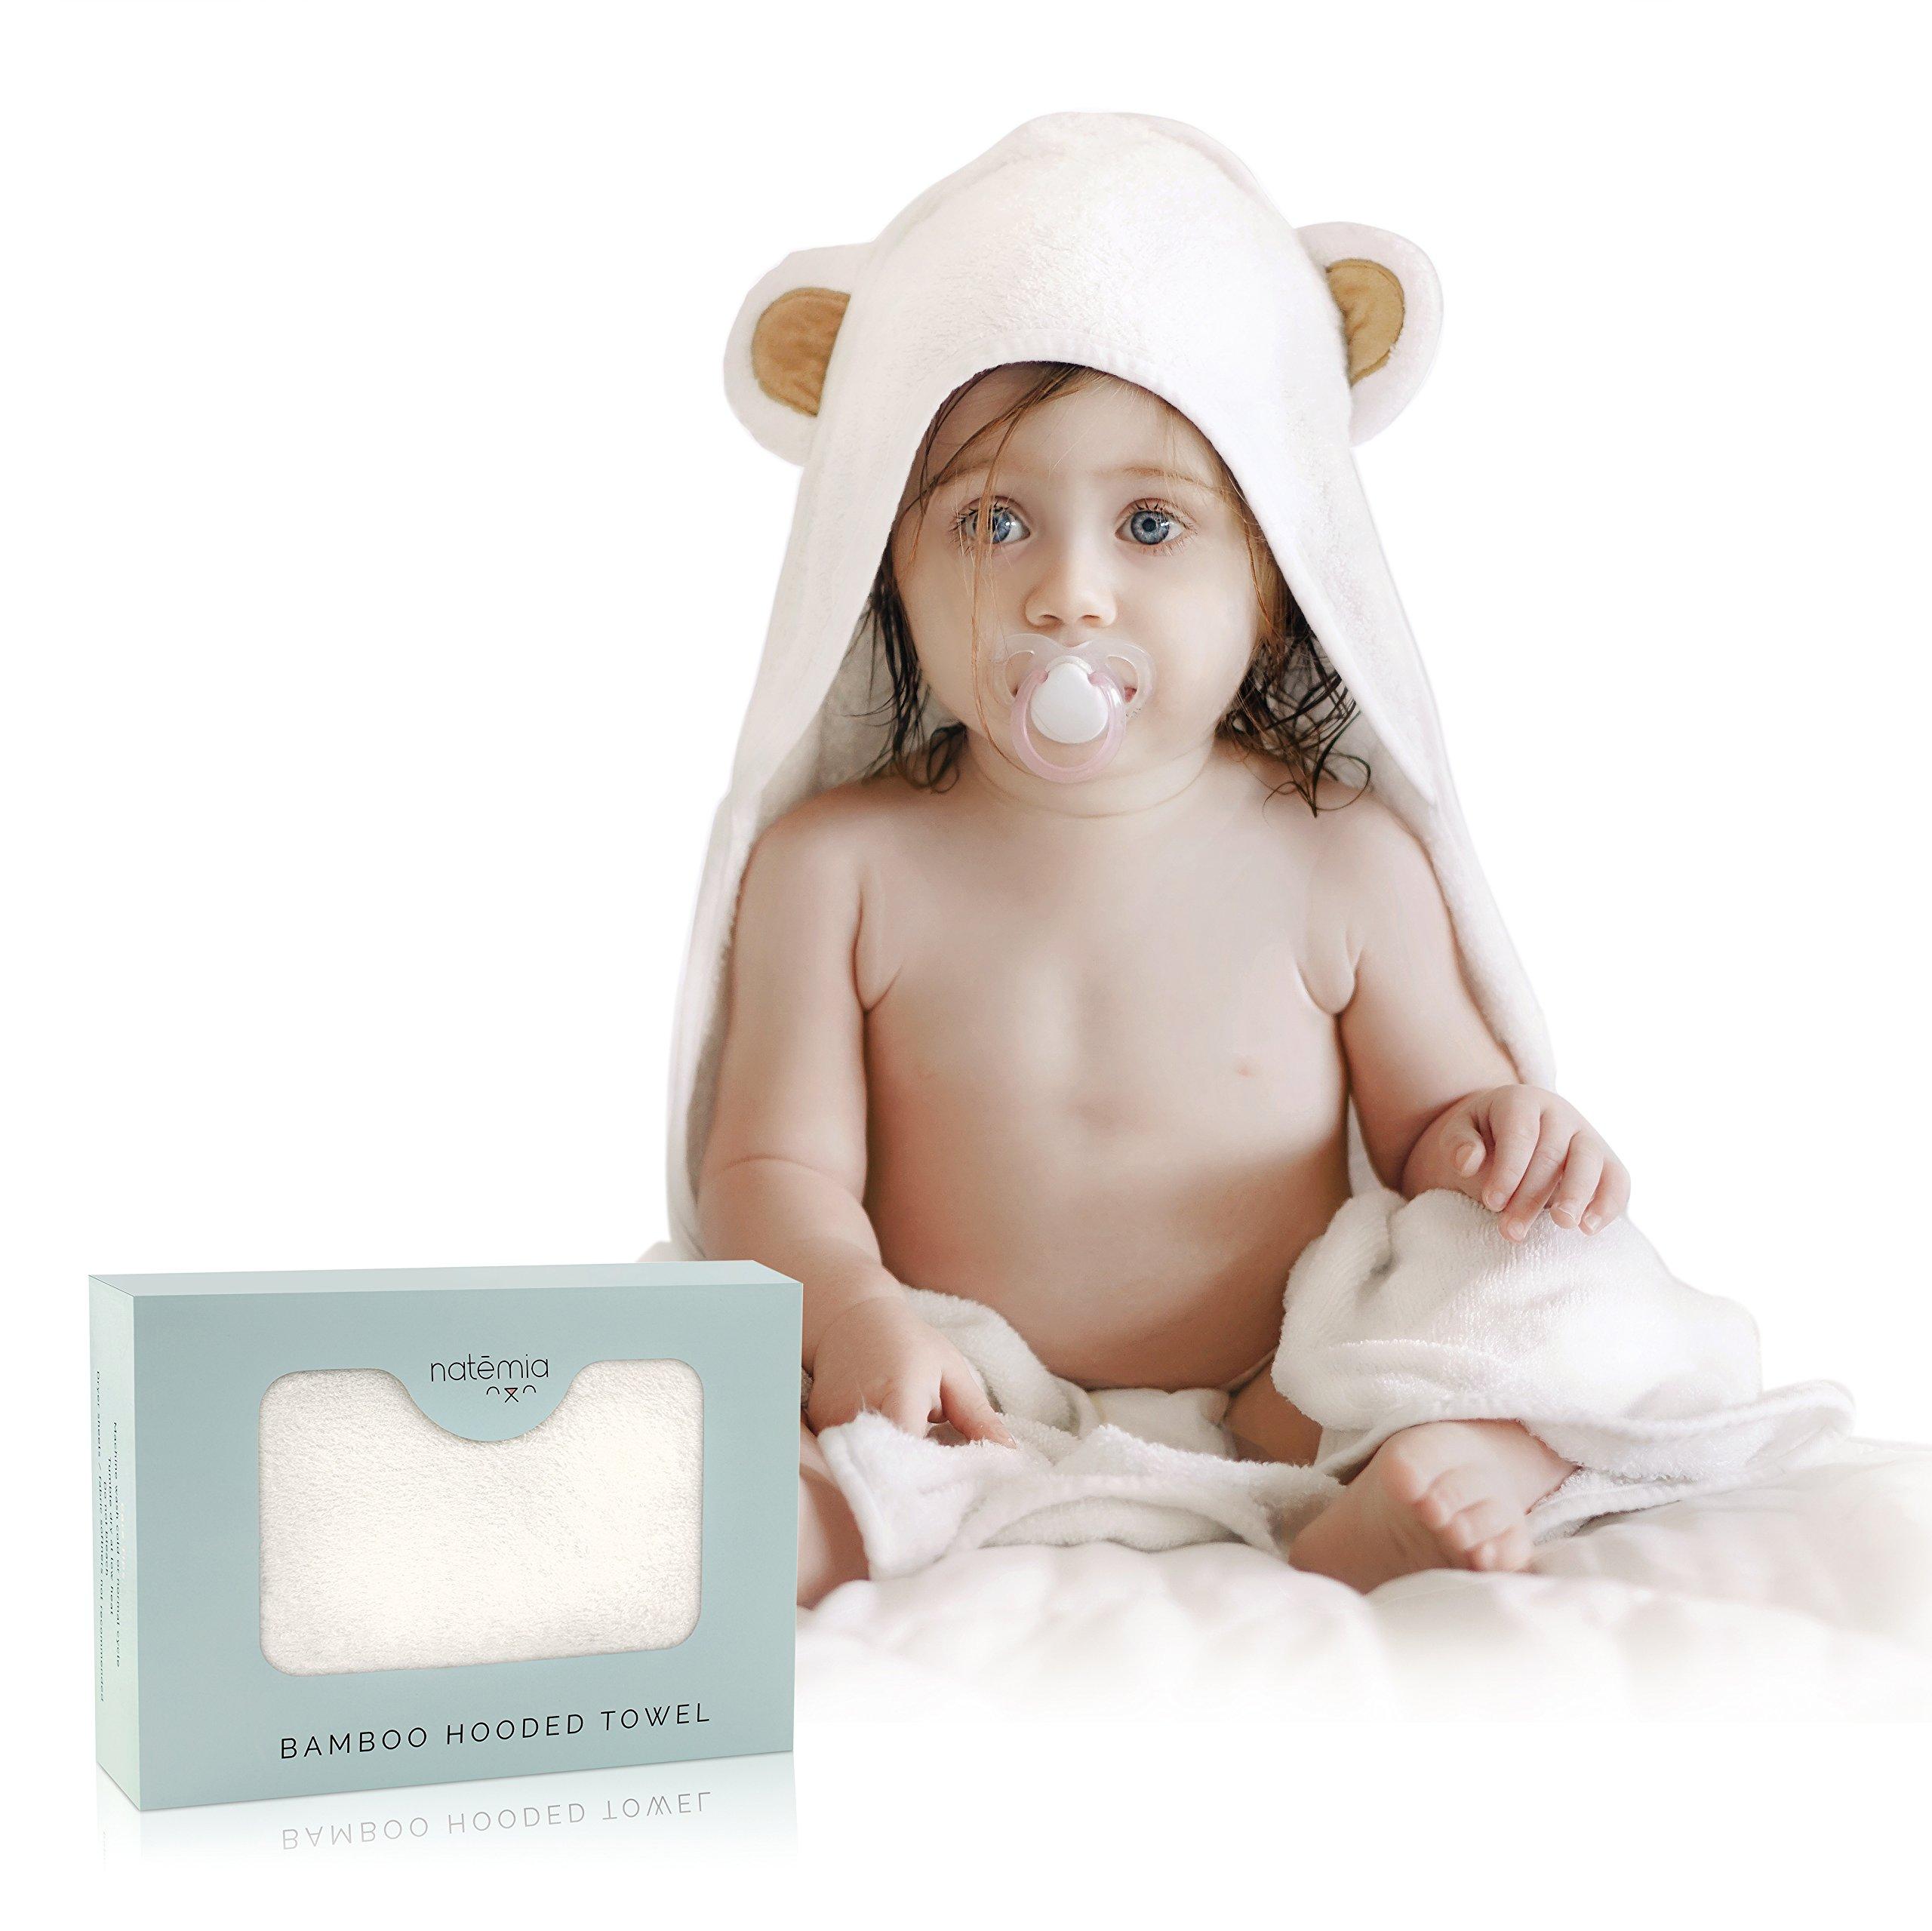 Amazon.com : Puj Tub - The Soft, Foldable Baby Bathtub - Newborn ...